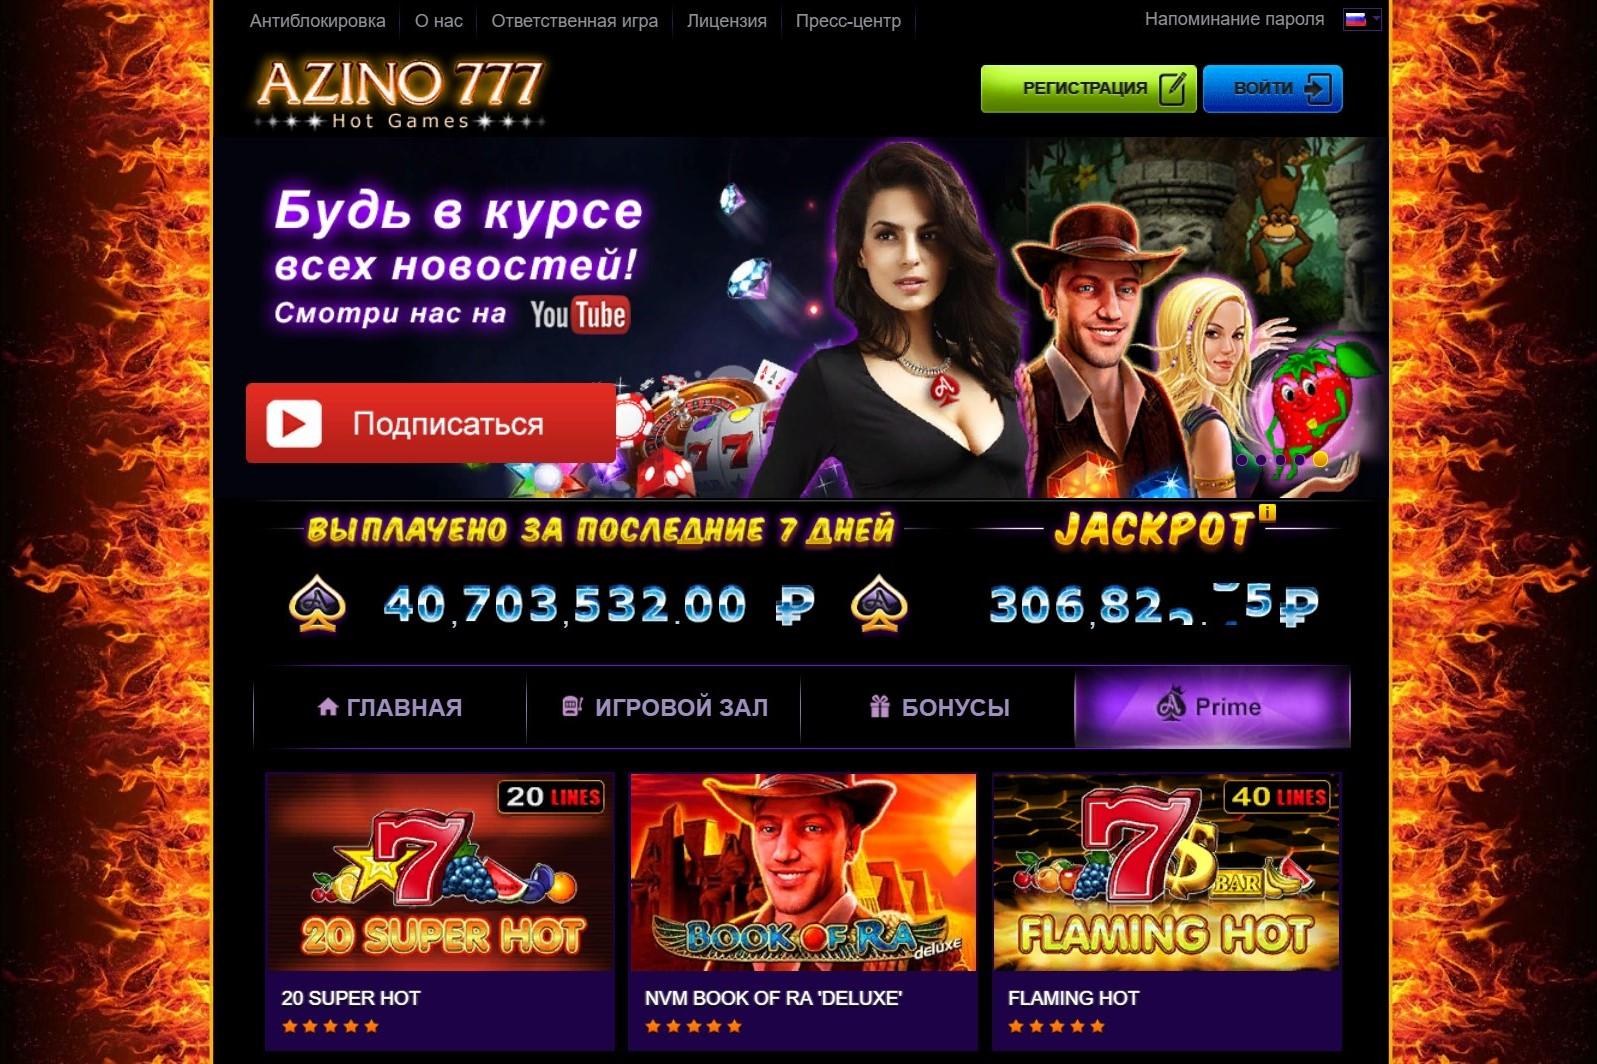 azino777 site